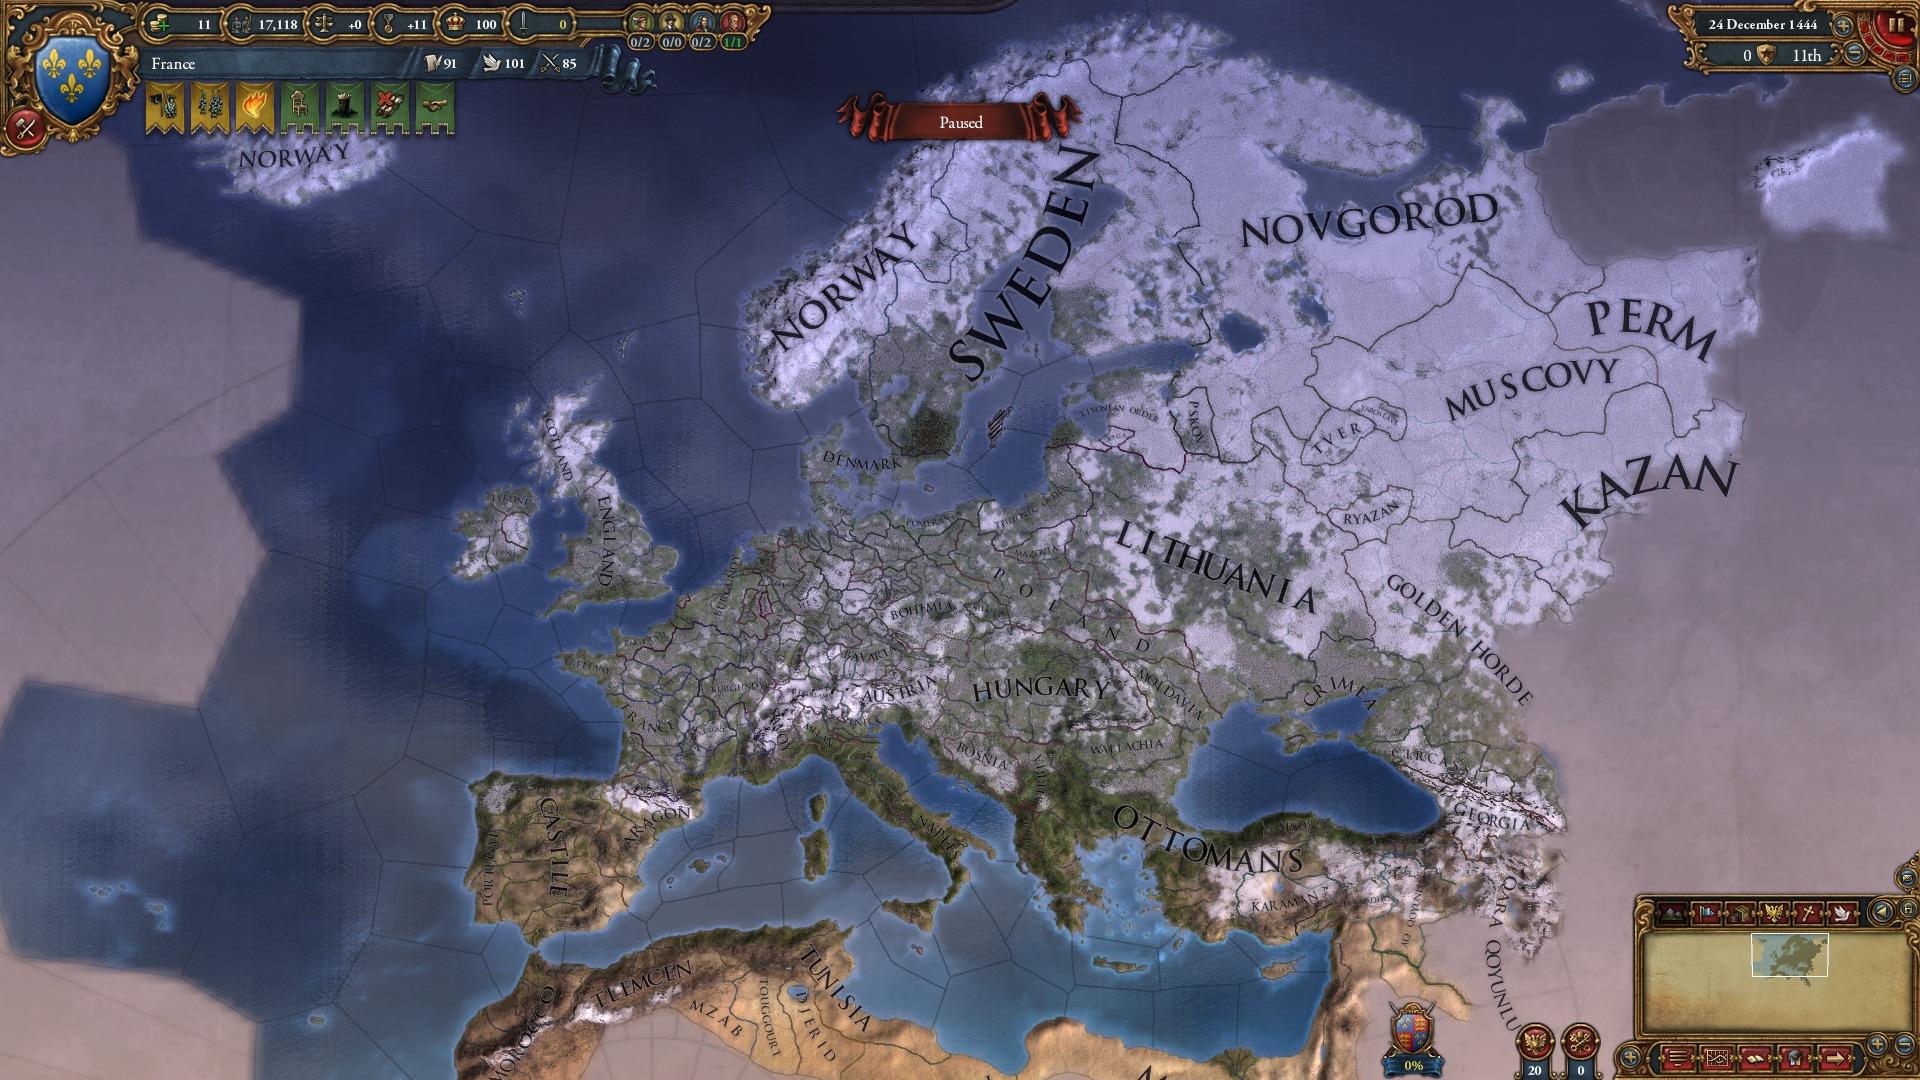 Mare nostrum expansion for europa universalis iv arriving april.